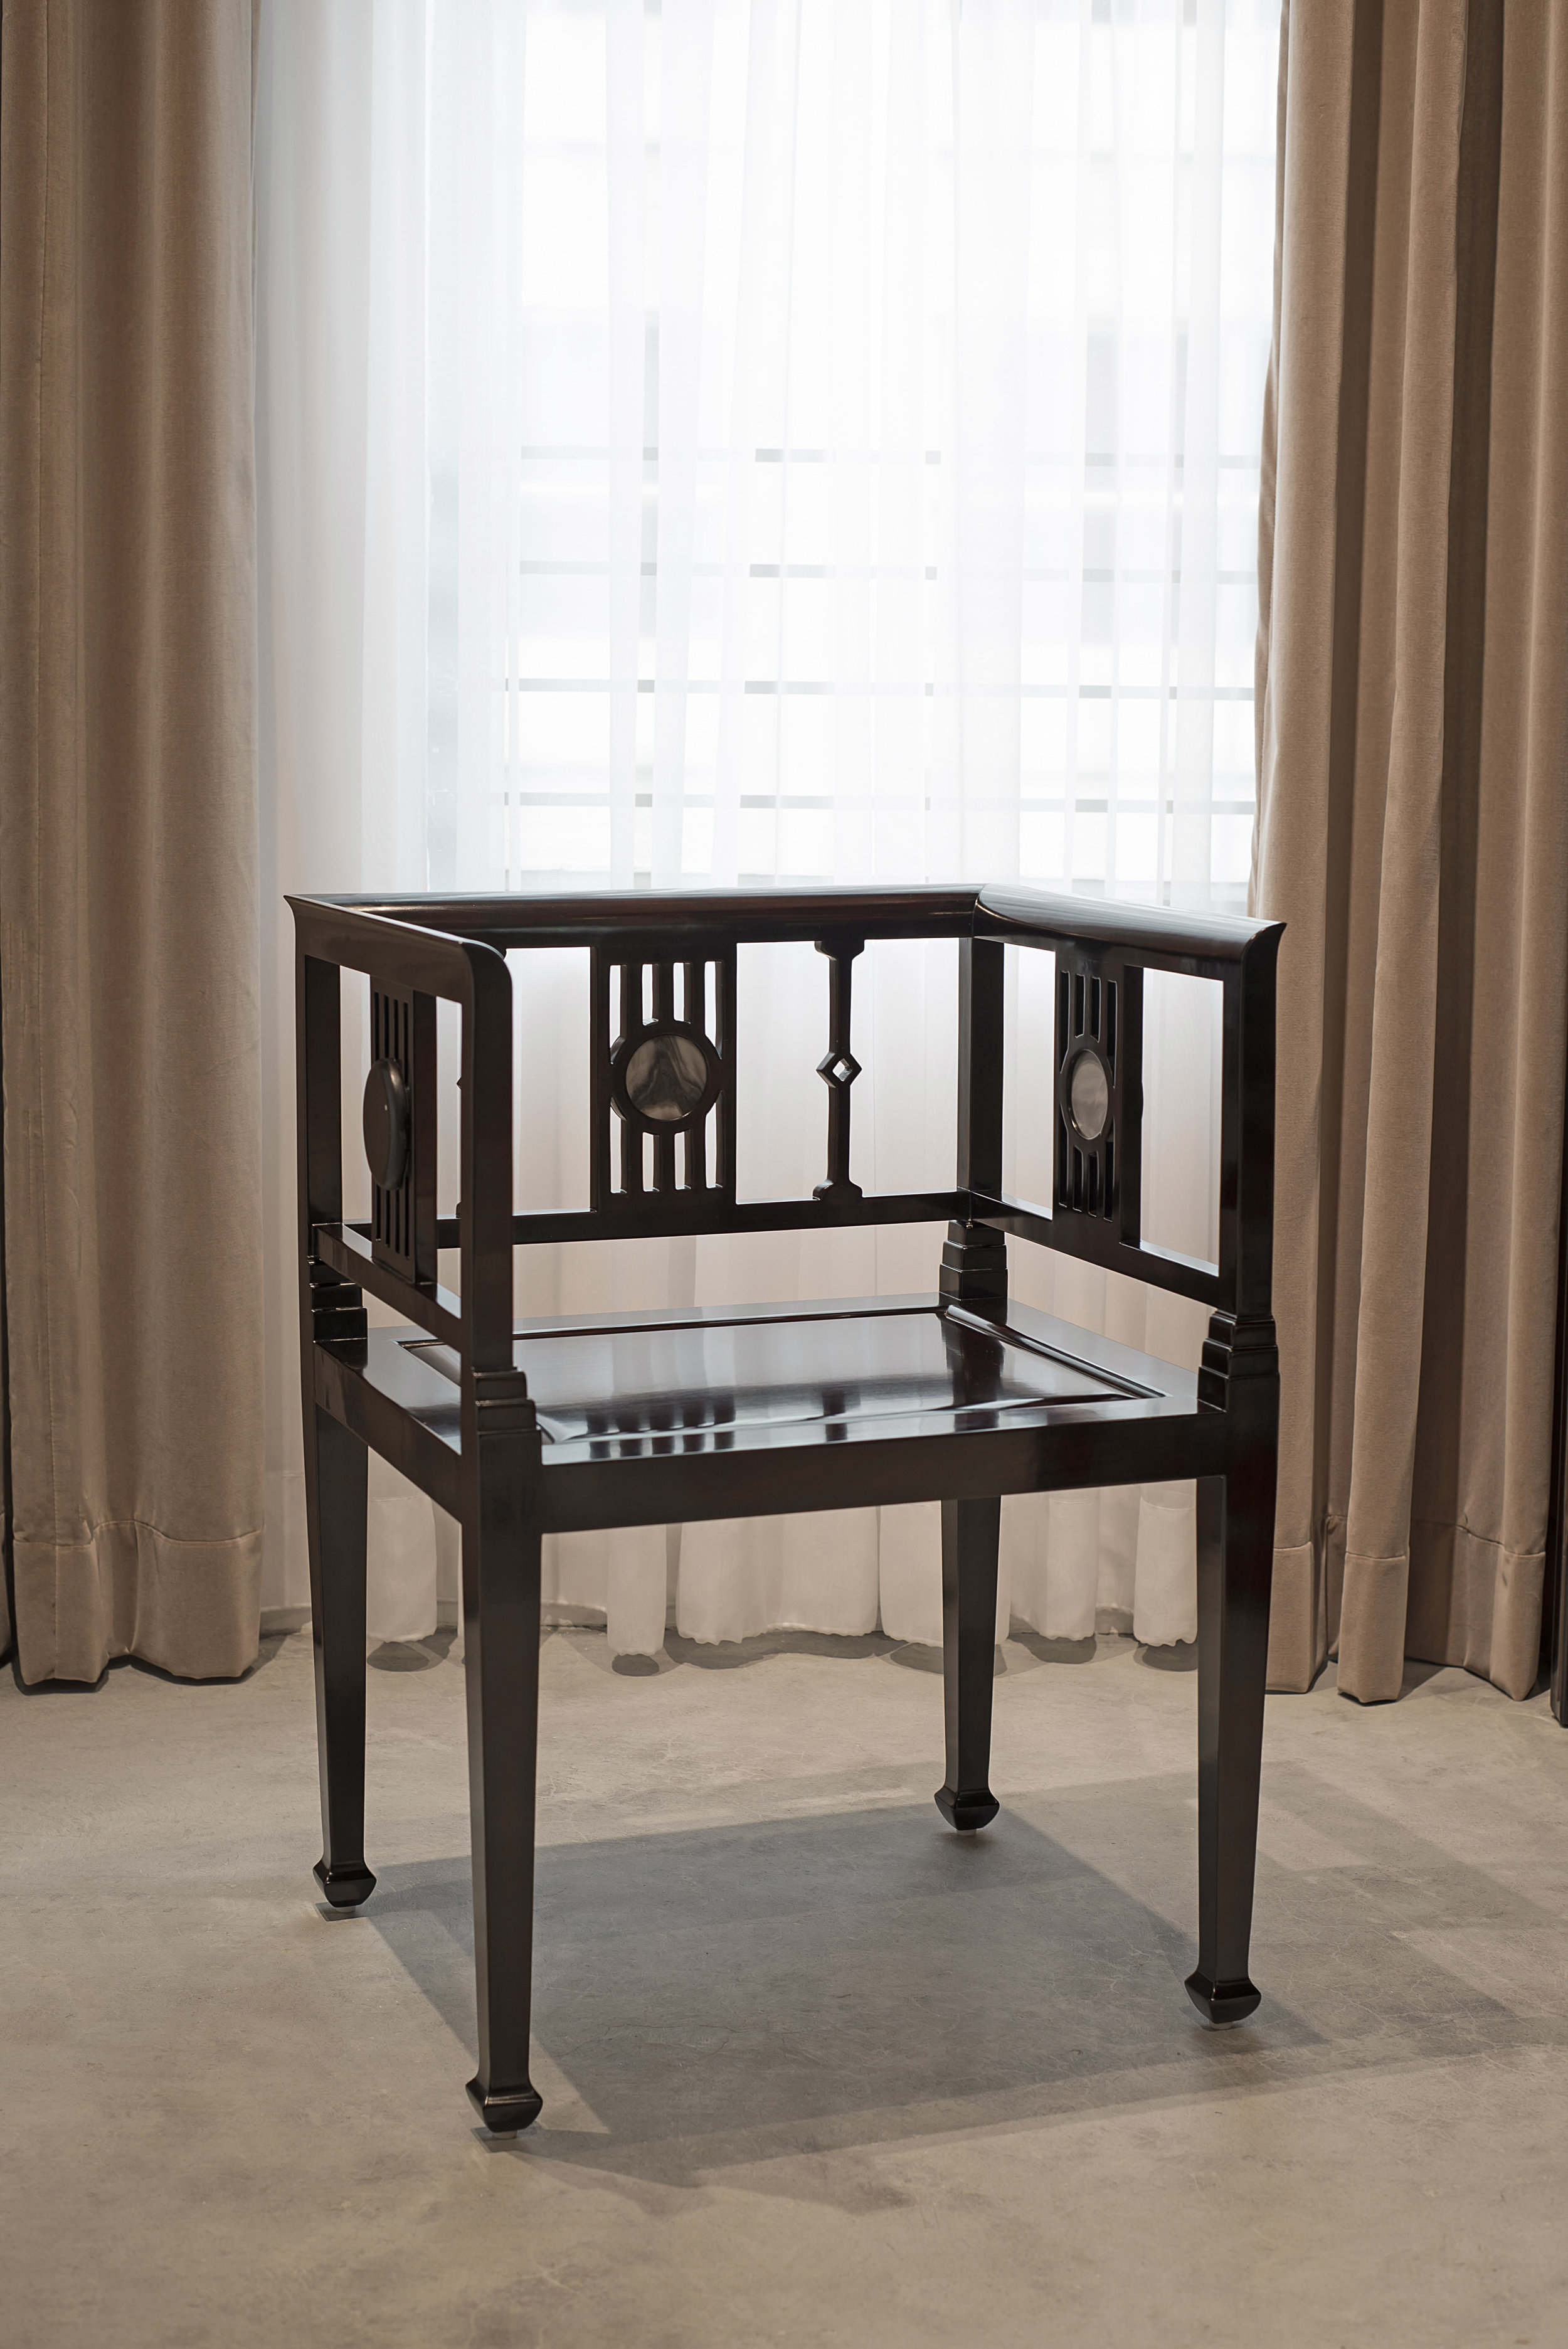 ....bespoke art deco style furniture : armchair..特别定制艺术装饰风格家具 : 扶手椅....